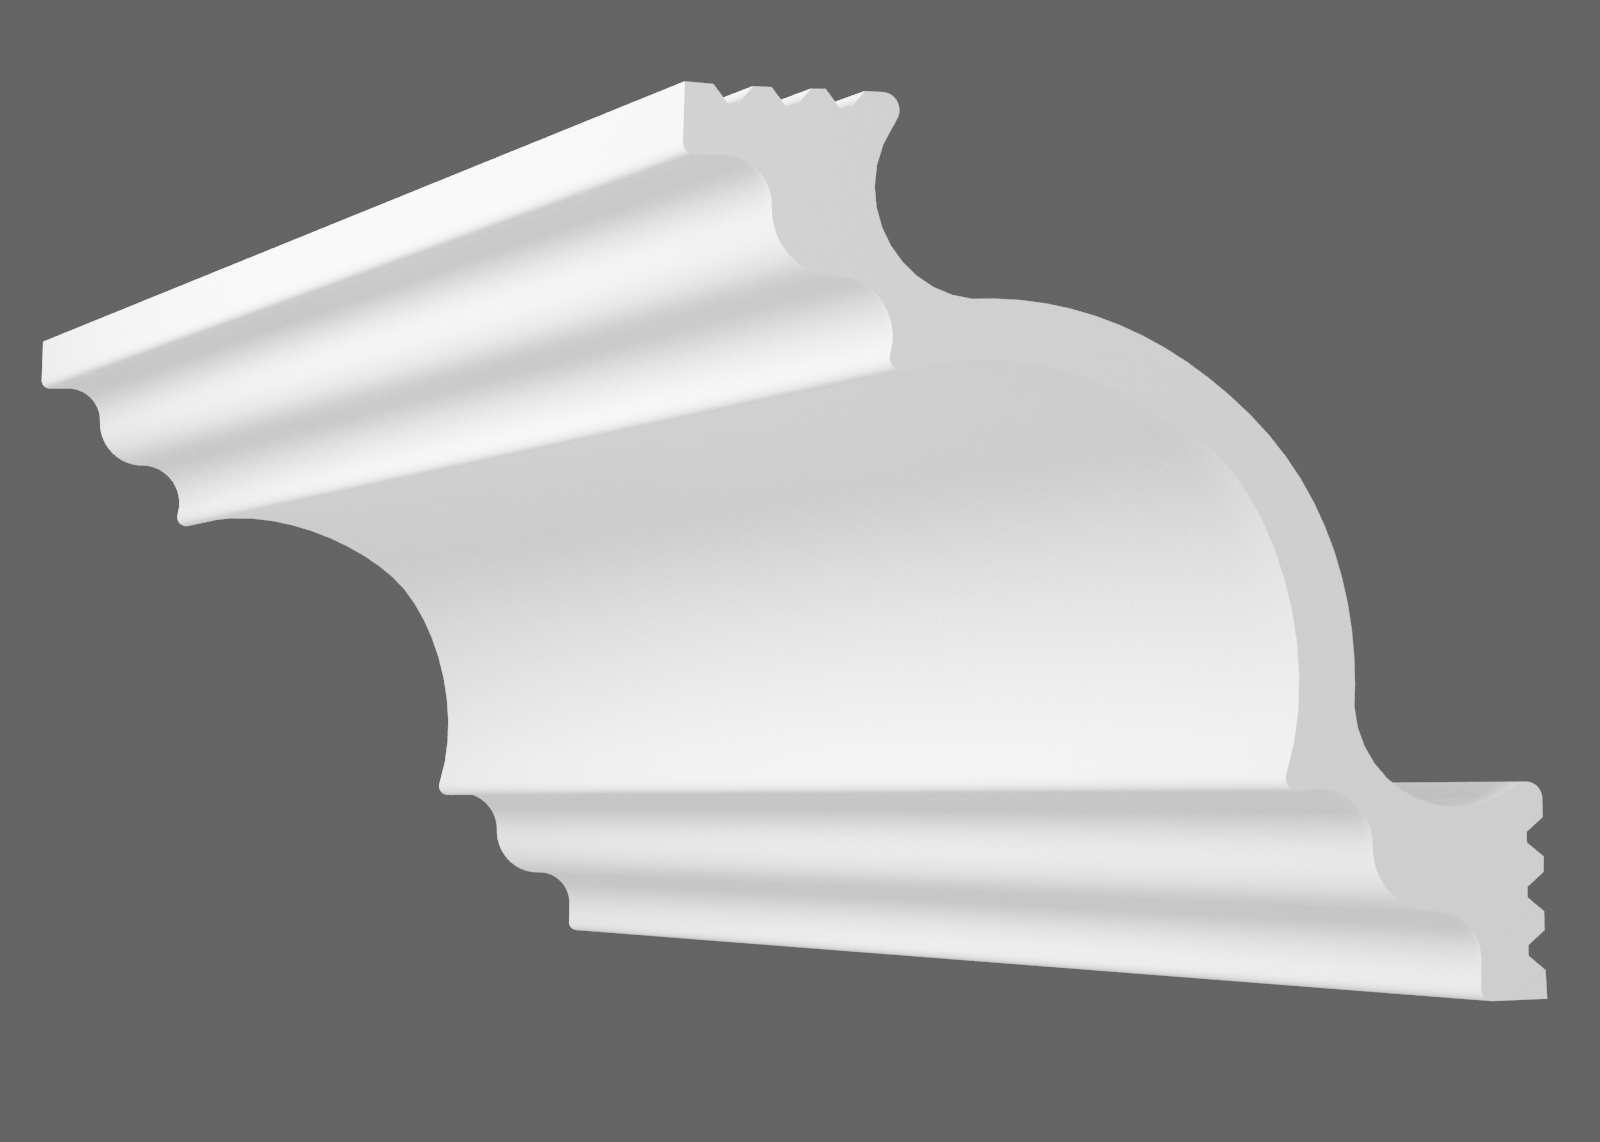 Потолочный плинтус К-200 (Размер:140х140мм)